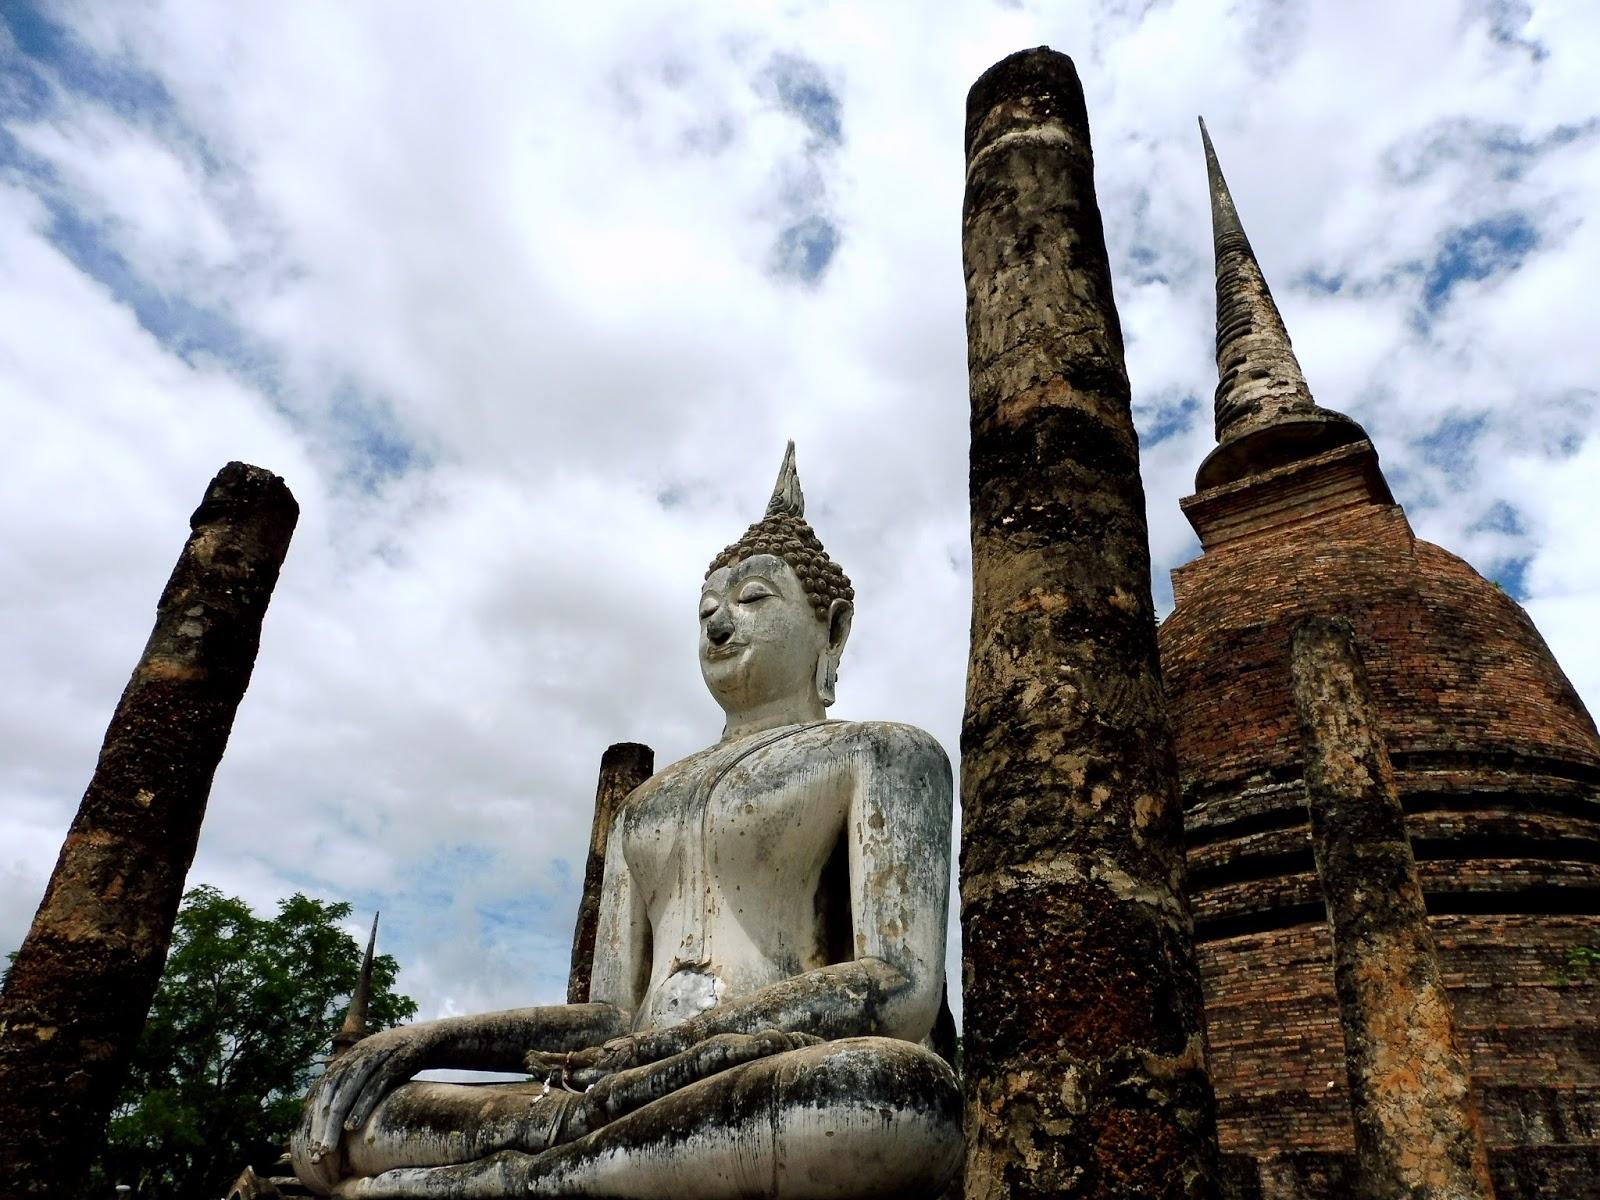 6. Parque Histórico de Sukhothai